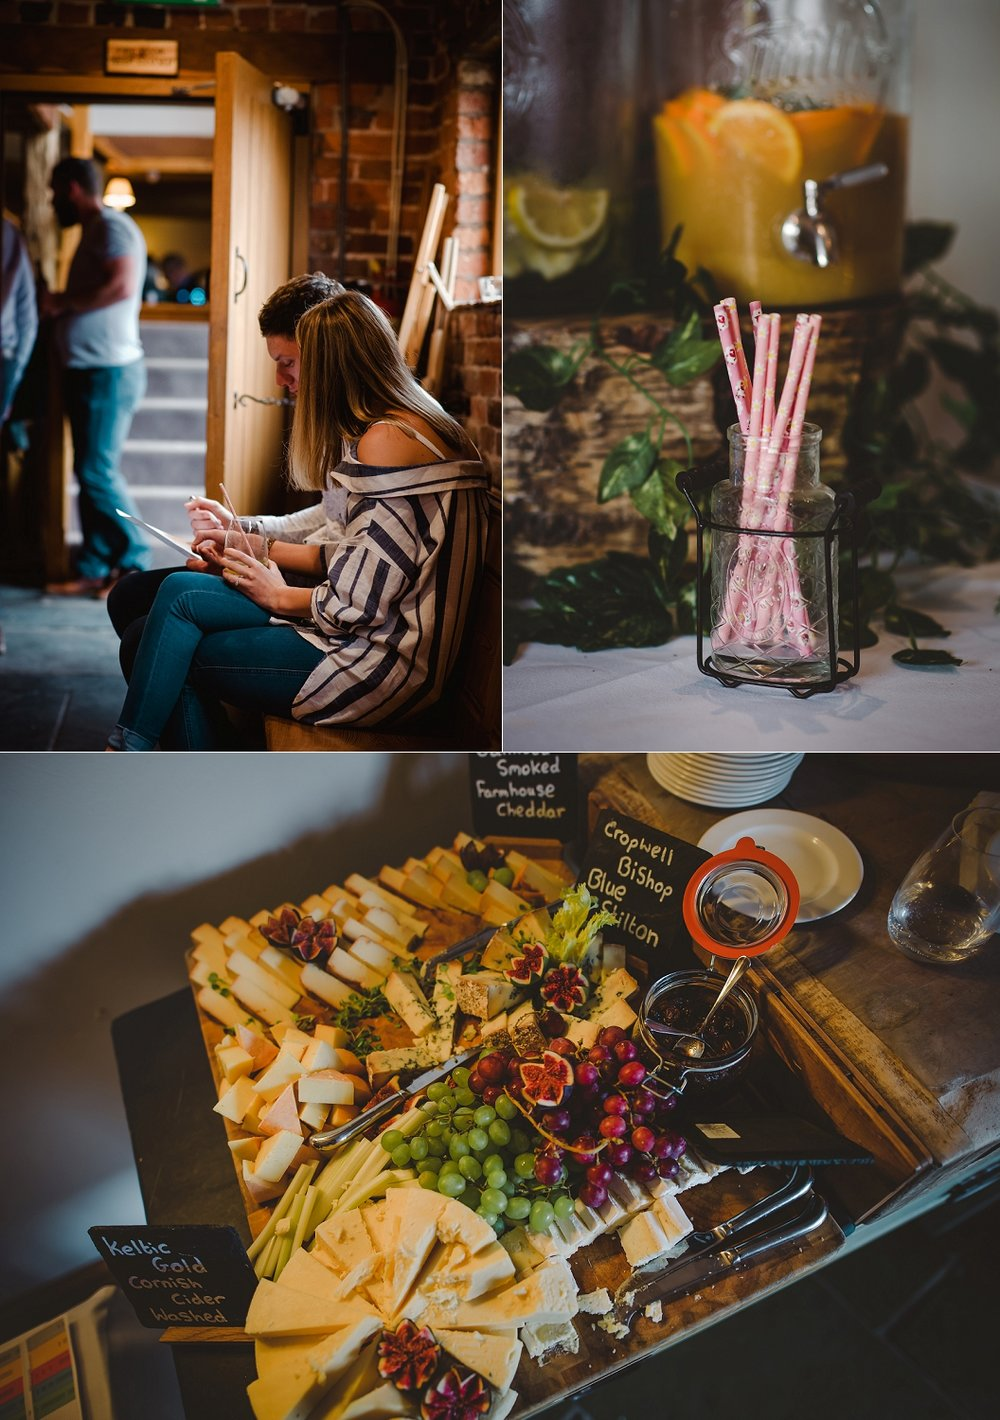 Curradine_Tasting_Event_Oct_2017_amytiphoto_0027.jpg